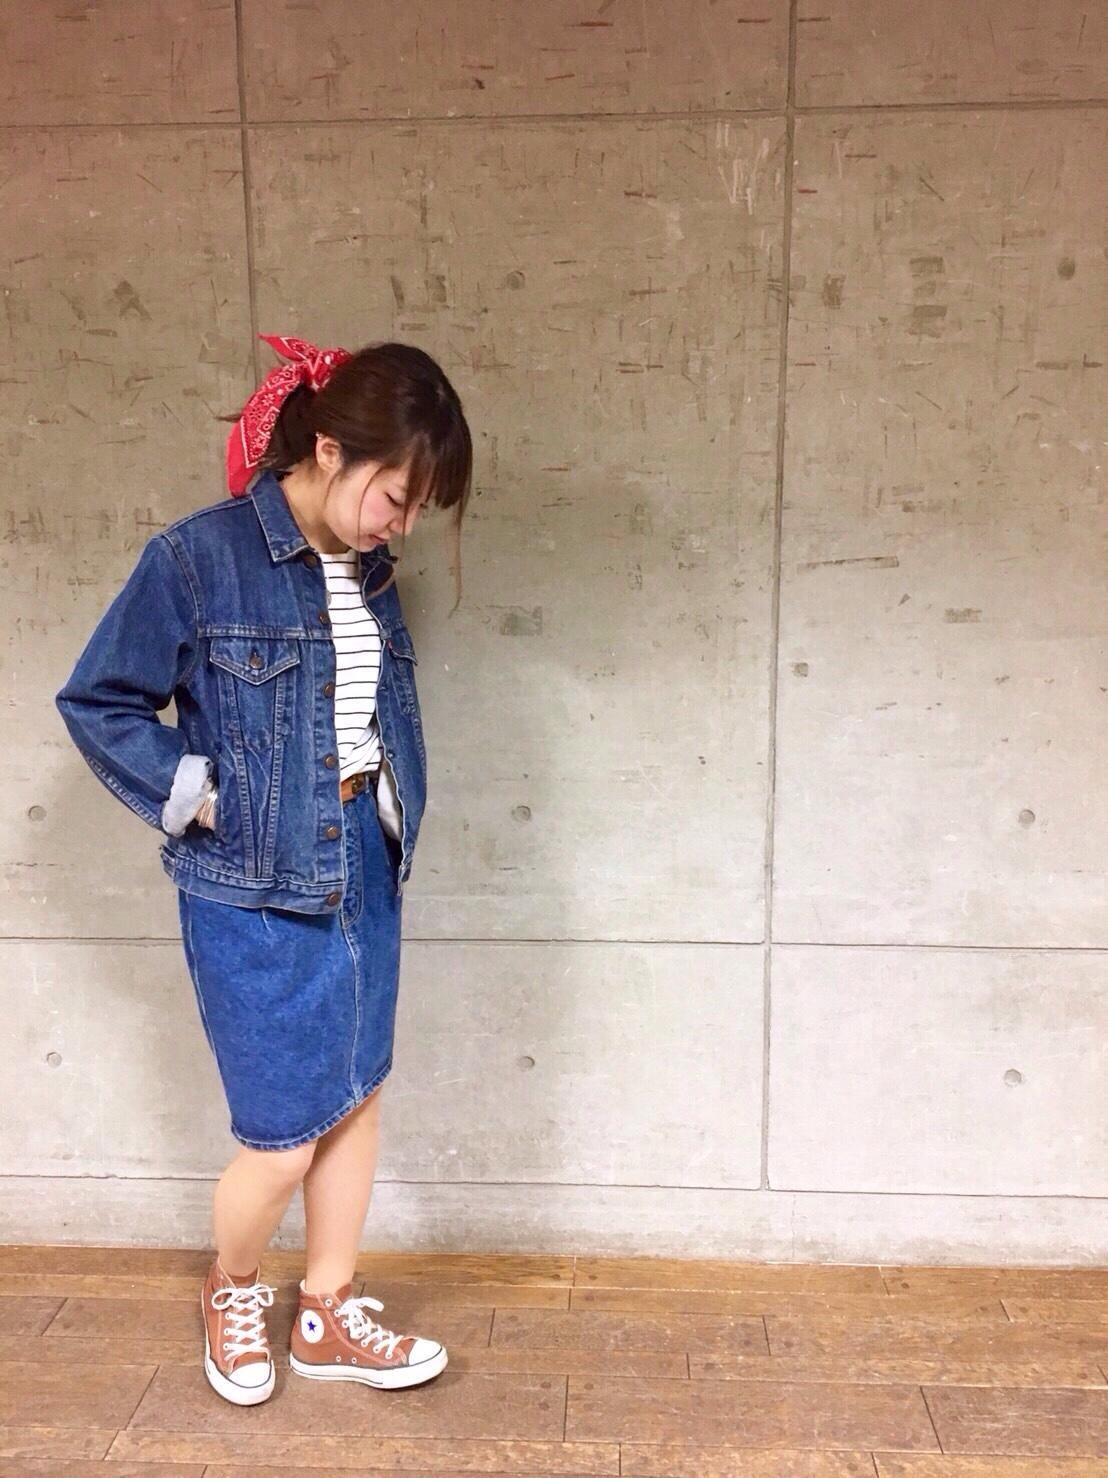 fc2blog_20170412151353806.jpg